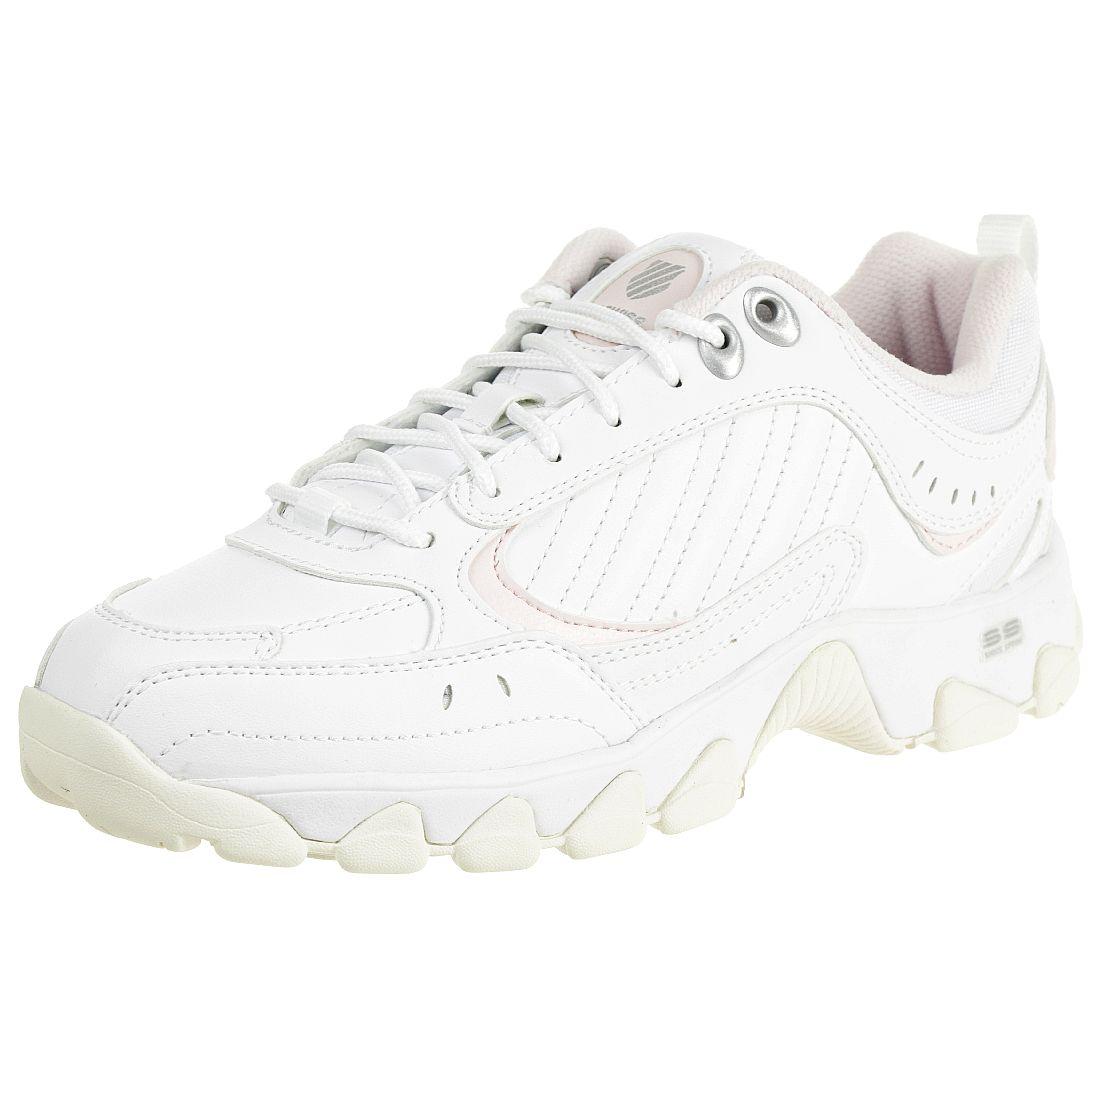 finest selection 6287a b20ff K-SWISS HS329 Sneaker Schuhe Damen 96354-162-M weiß Sneaker ...